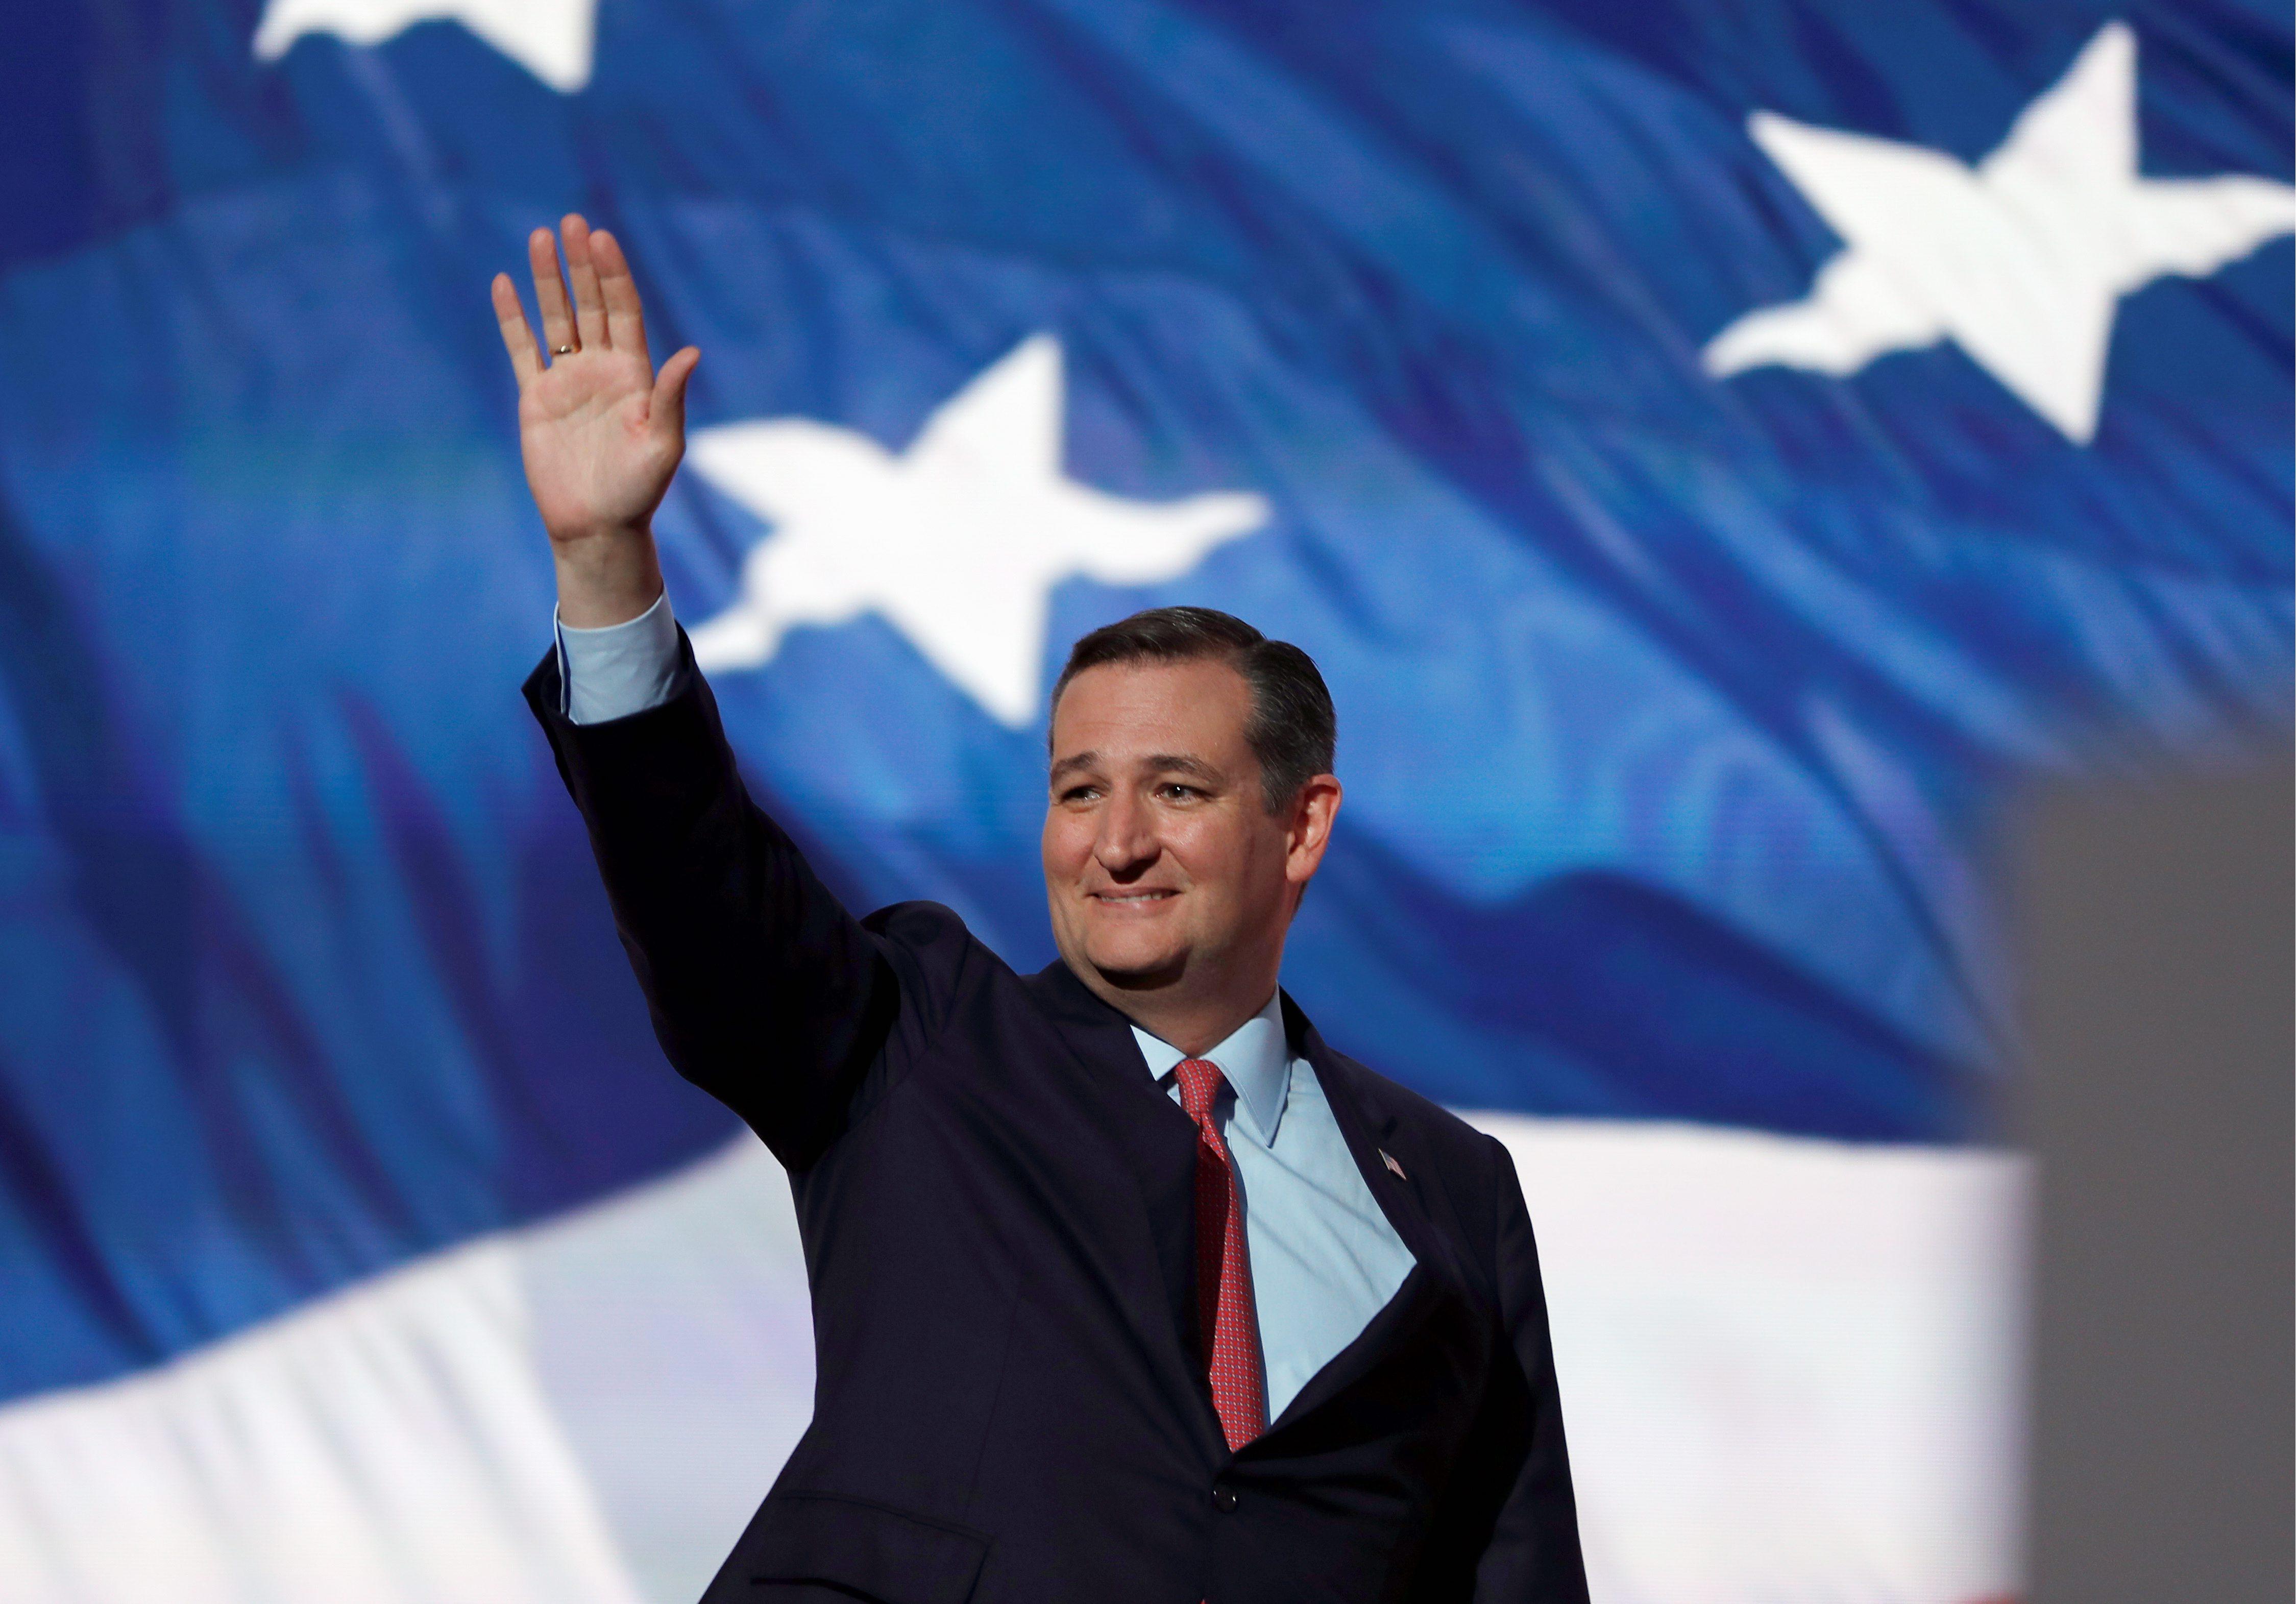 Ted Cruz quiet after convention speech, working to rebuild political brand